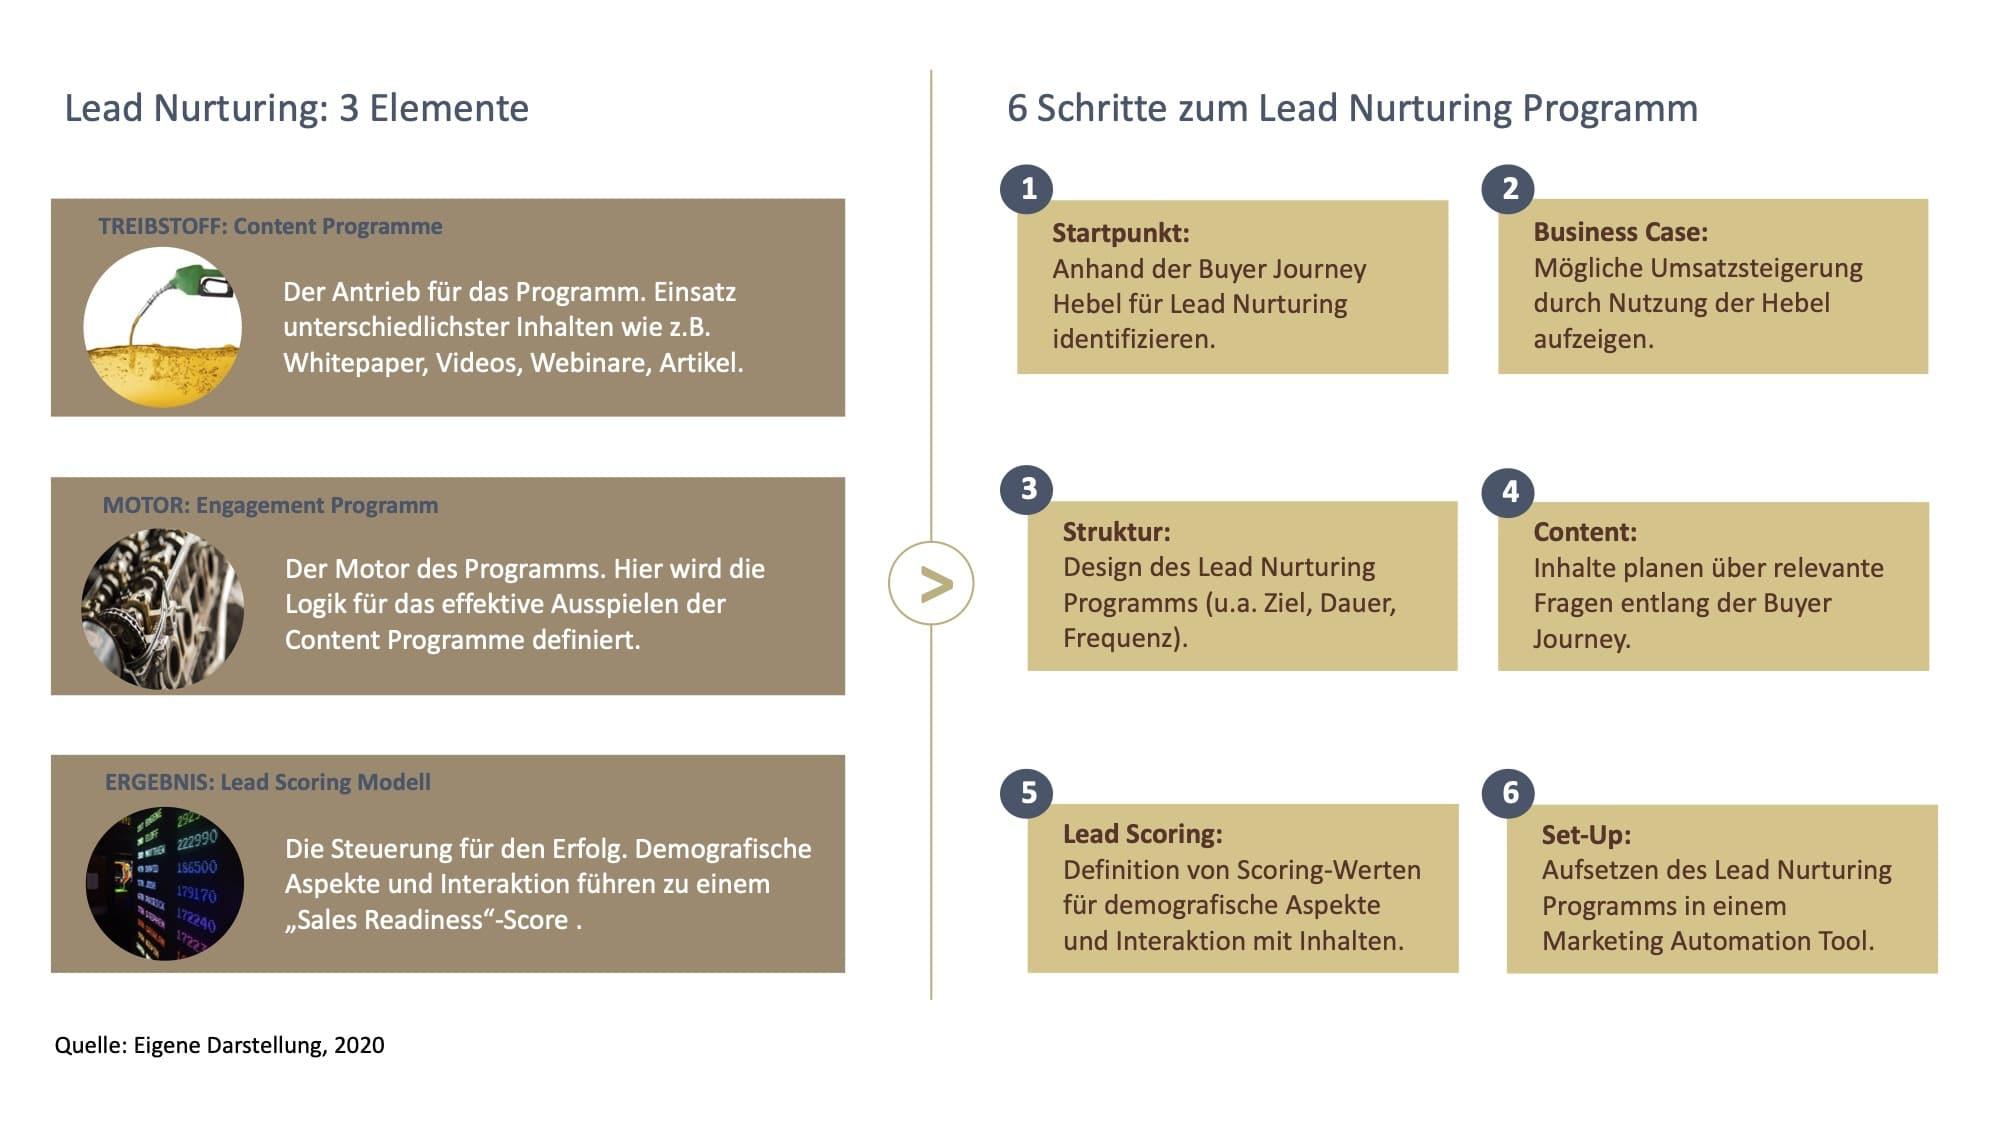 Lead Nurturing B2B Marketing